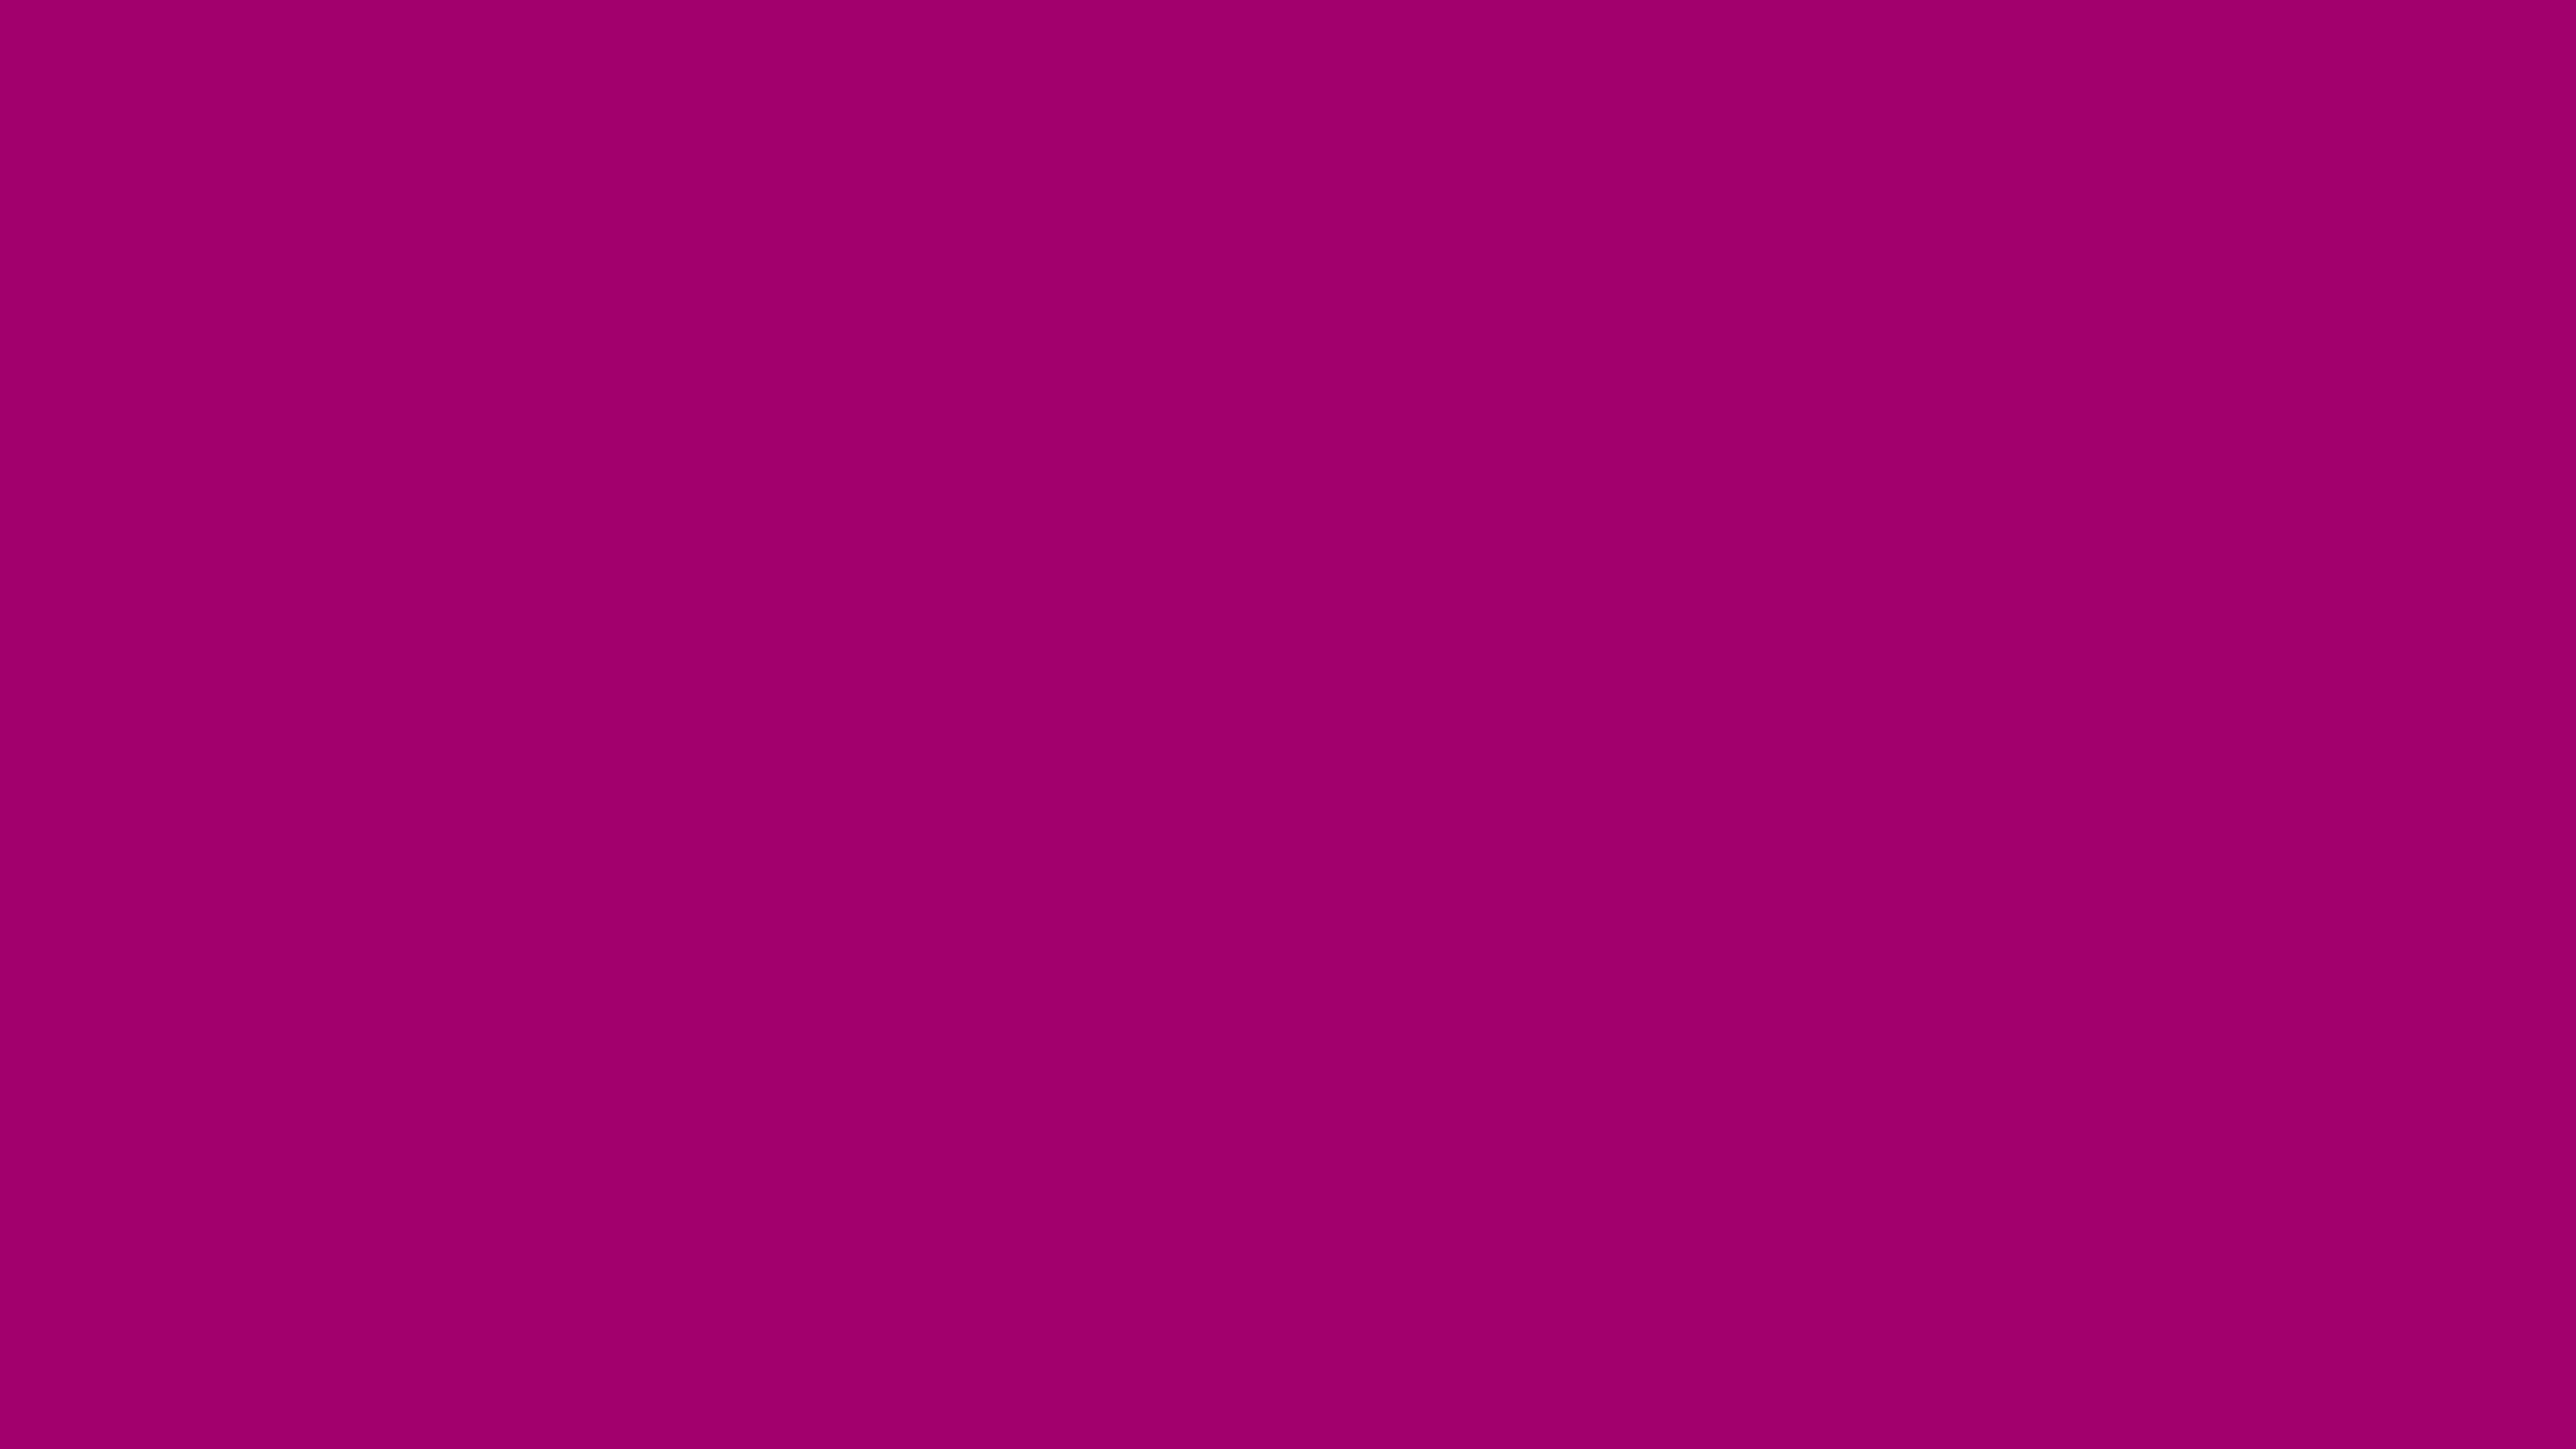 3840x2160 Flirt Solid Color Background